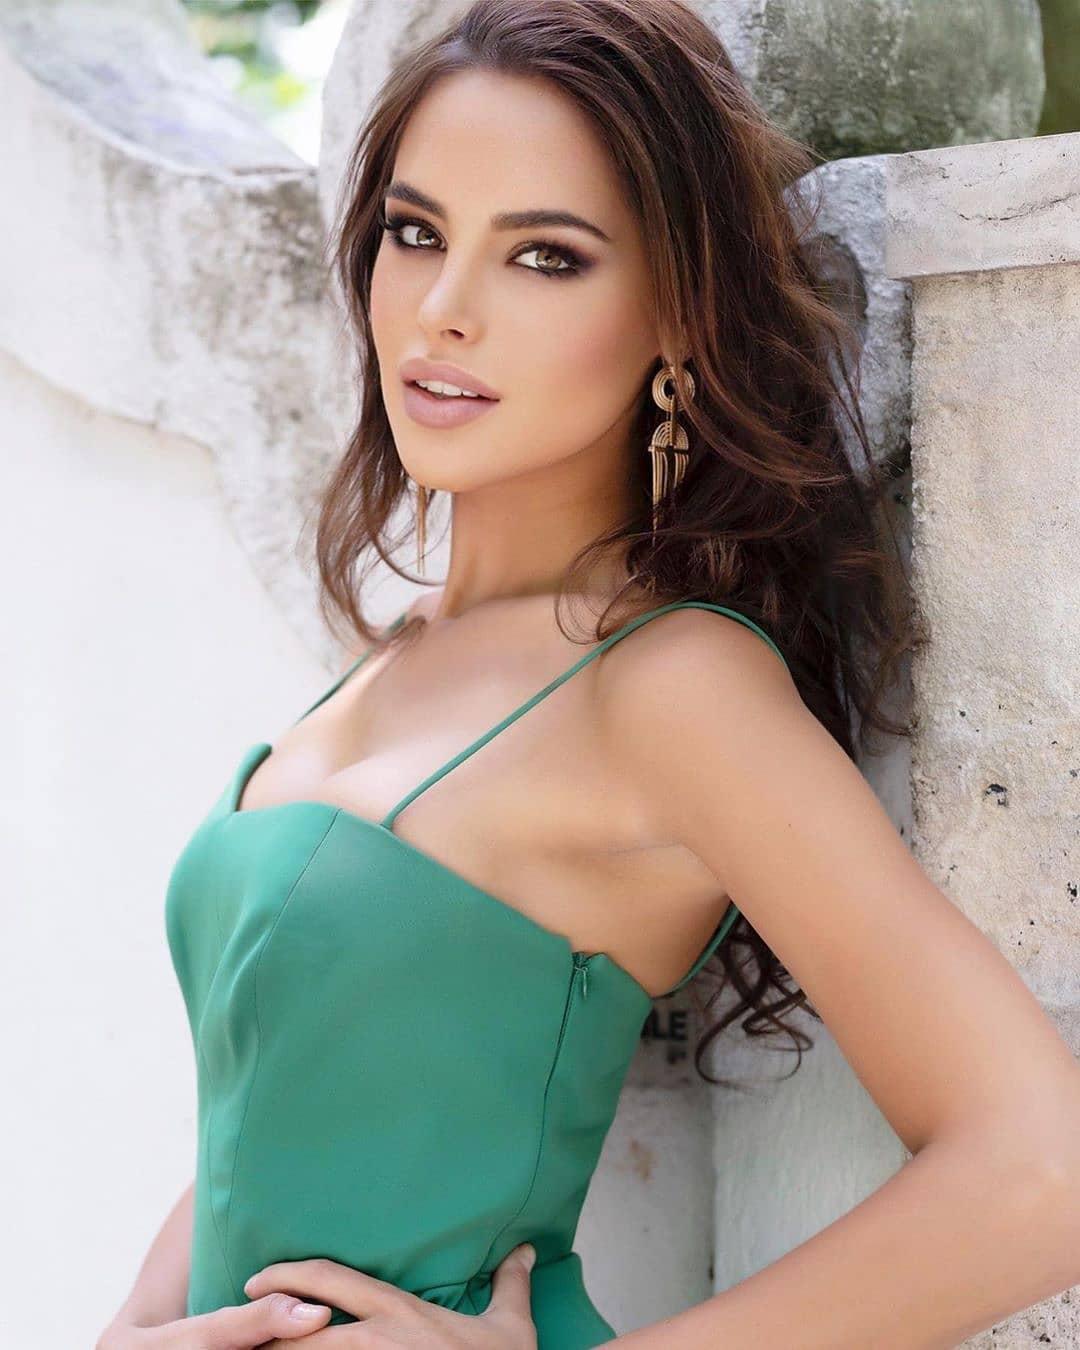 andrea de las heras, miss grand spain 2020/miss europe 2019. Andrea22